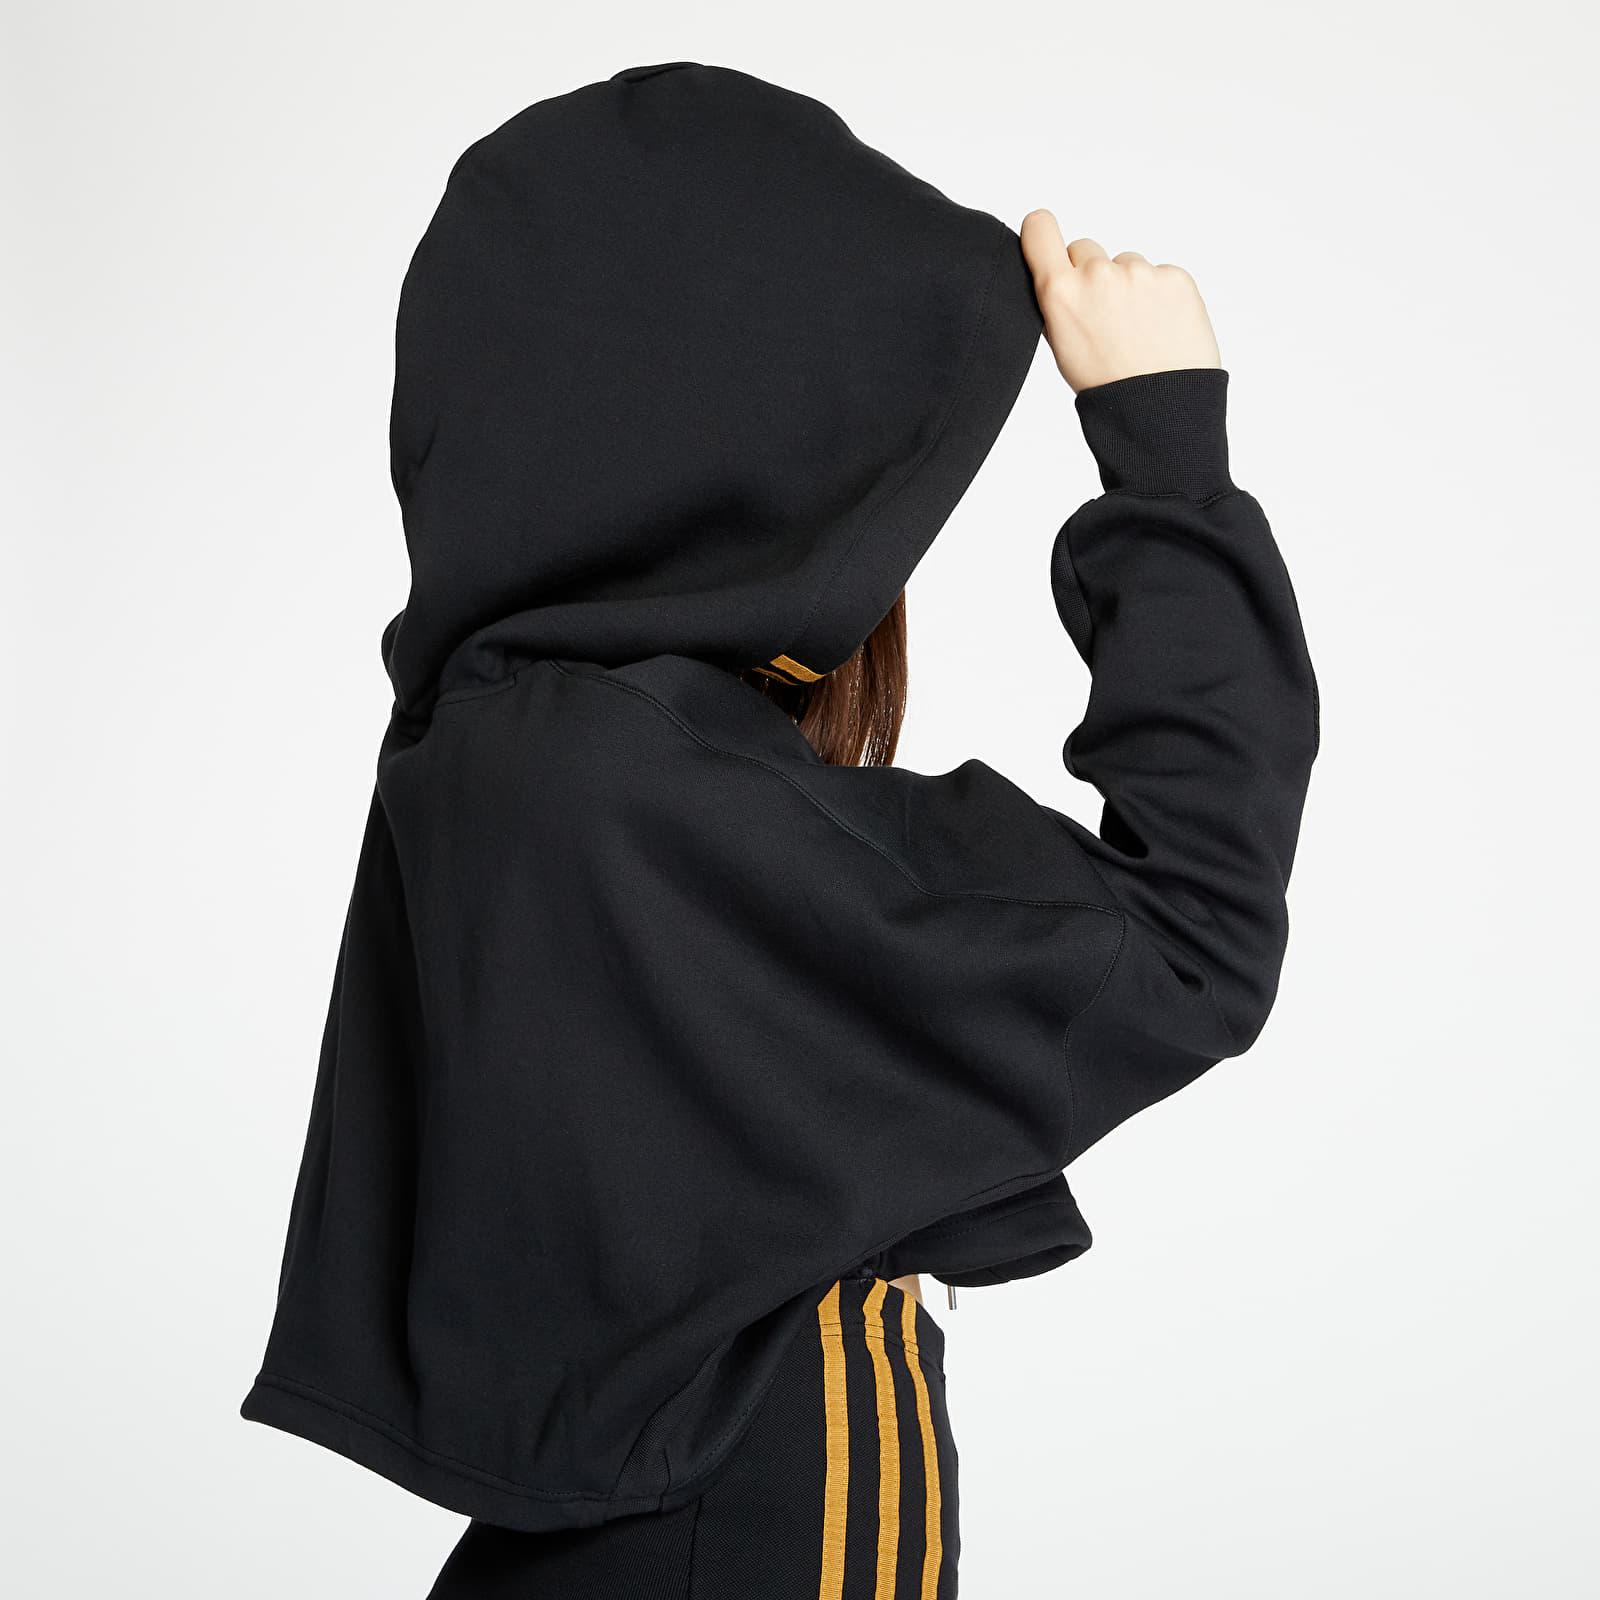 Dress adidas x Ivy Park Hooded Cropped Dress Black